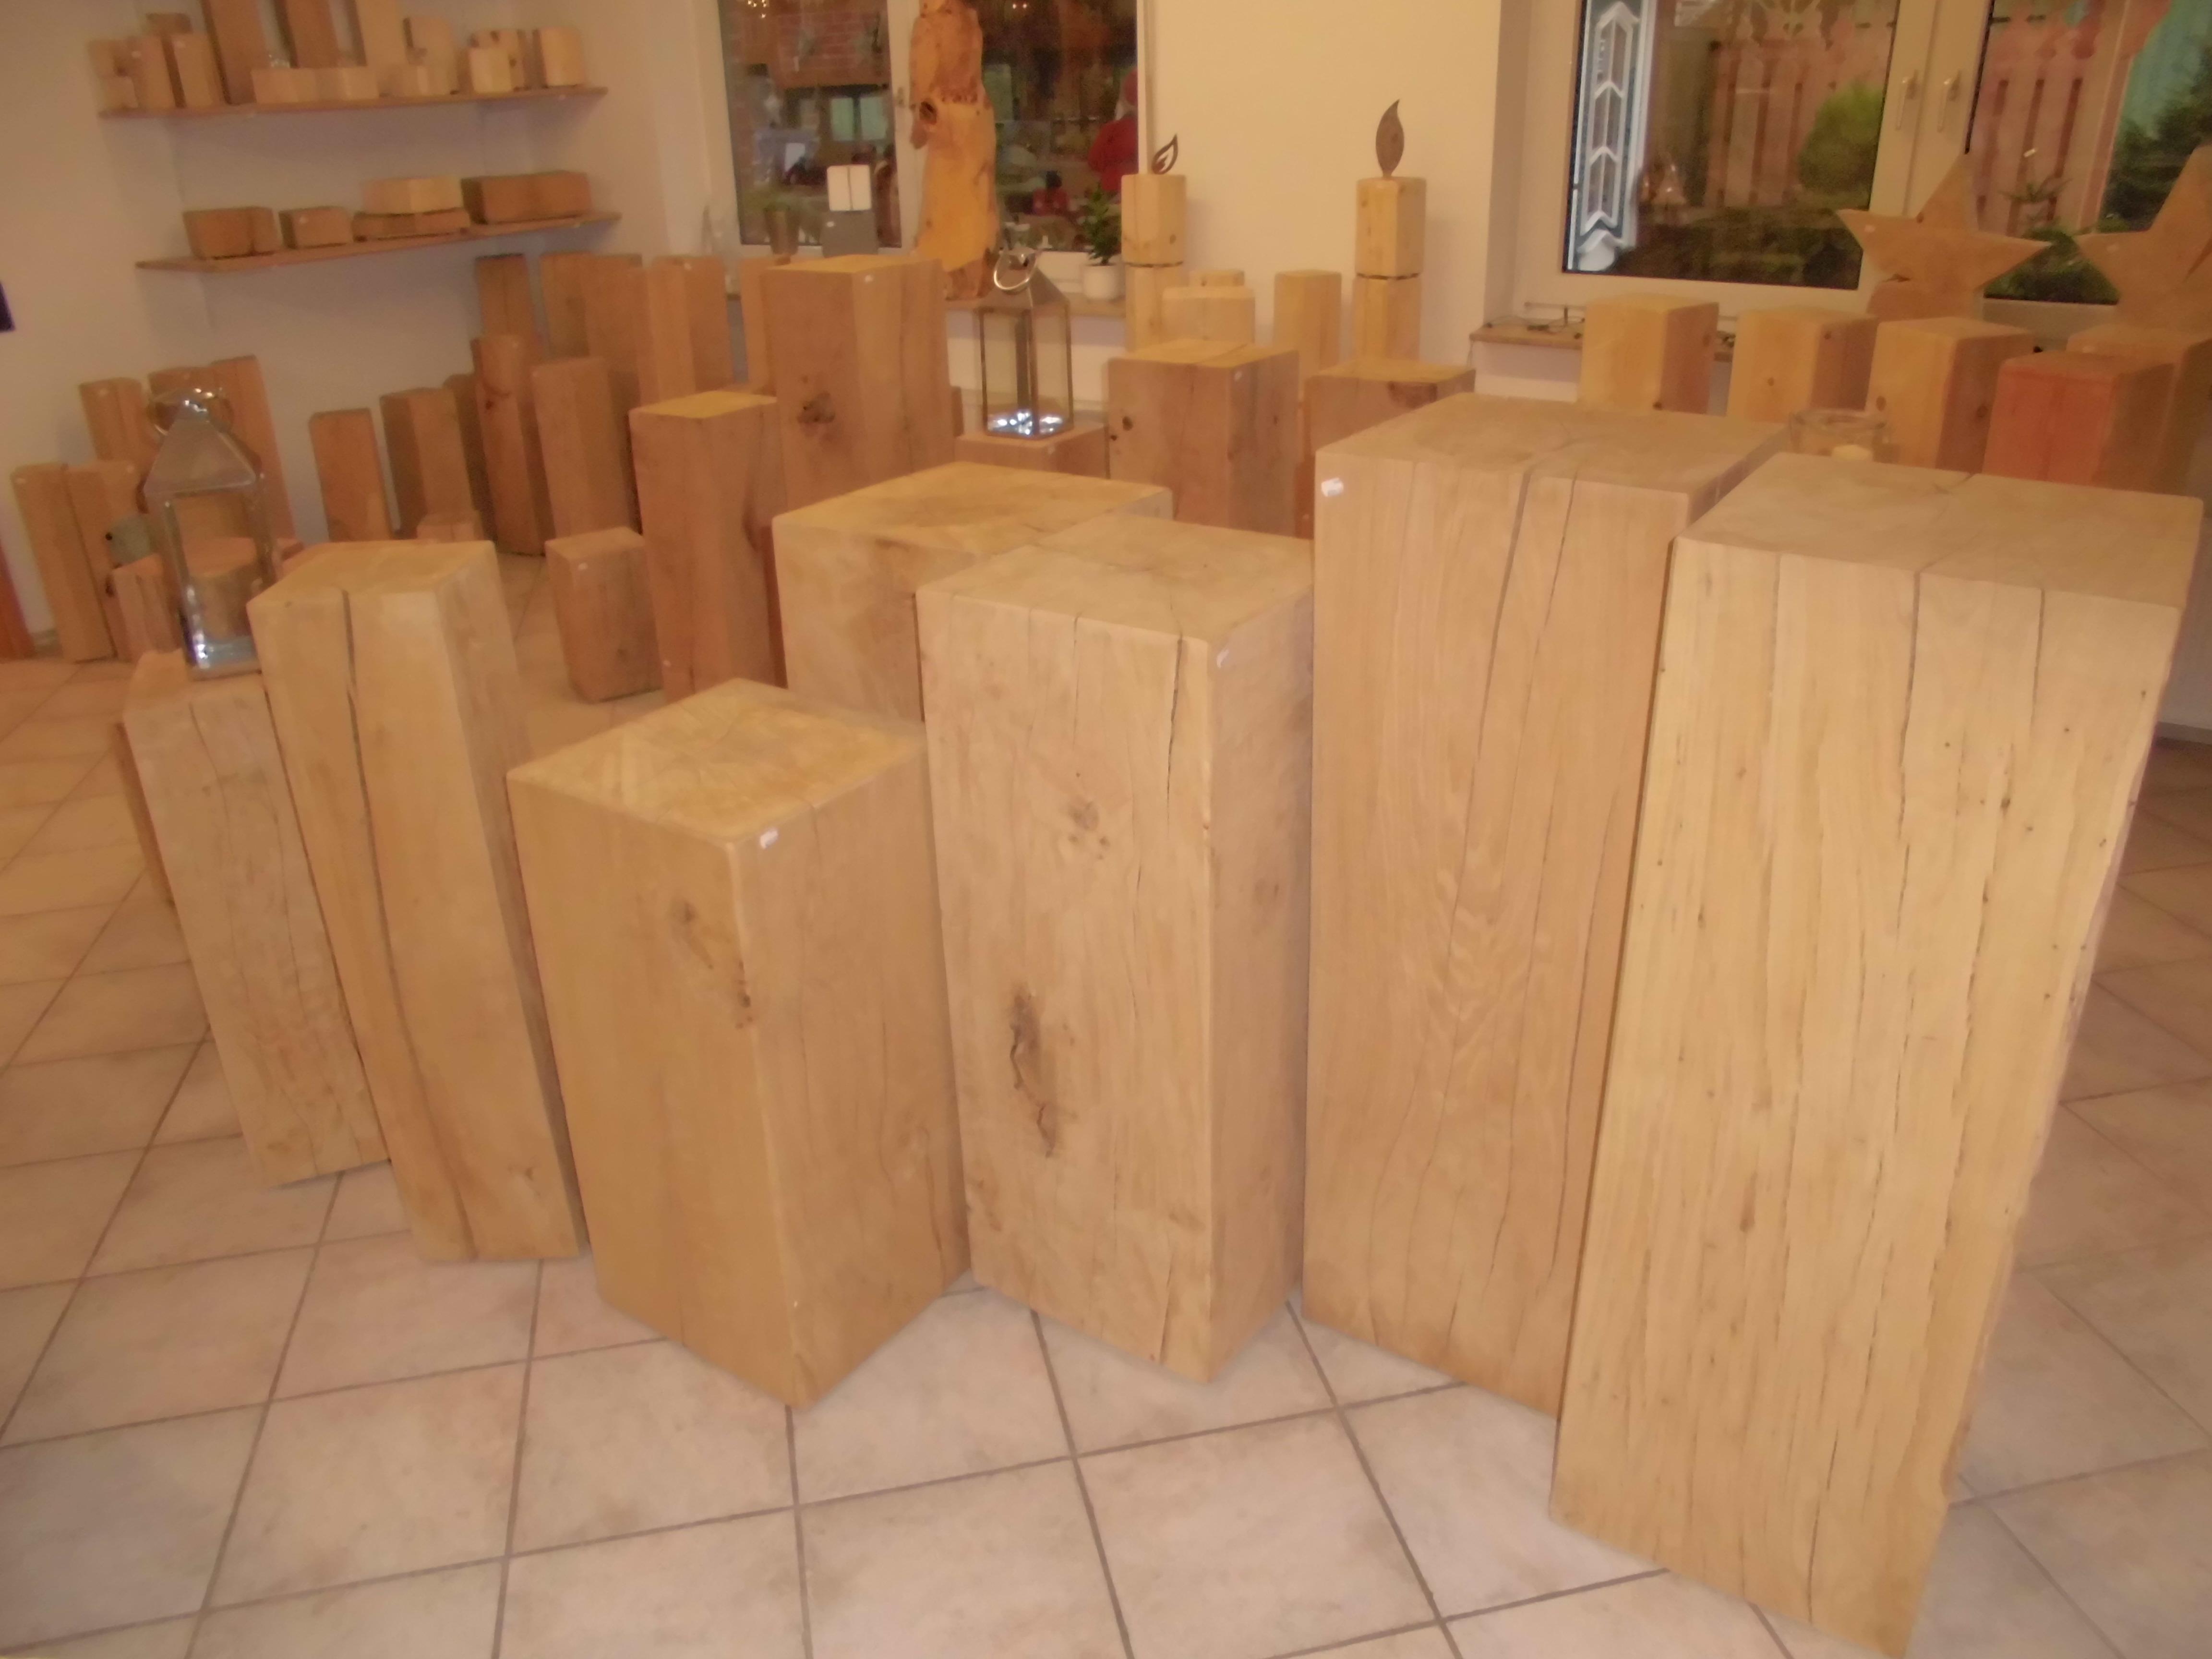 Eichenholzsäule gehobelt, geschliffen, angefast 15x15x60cm